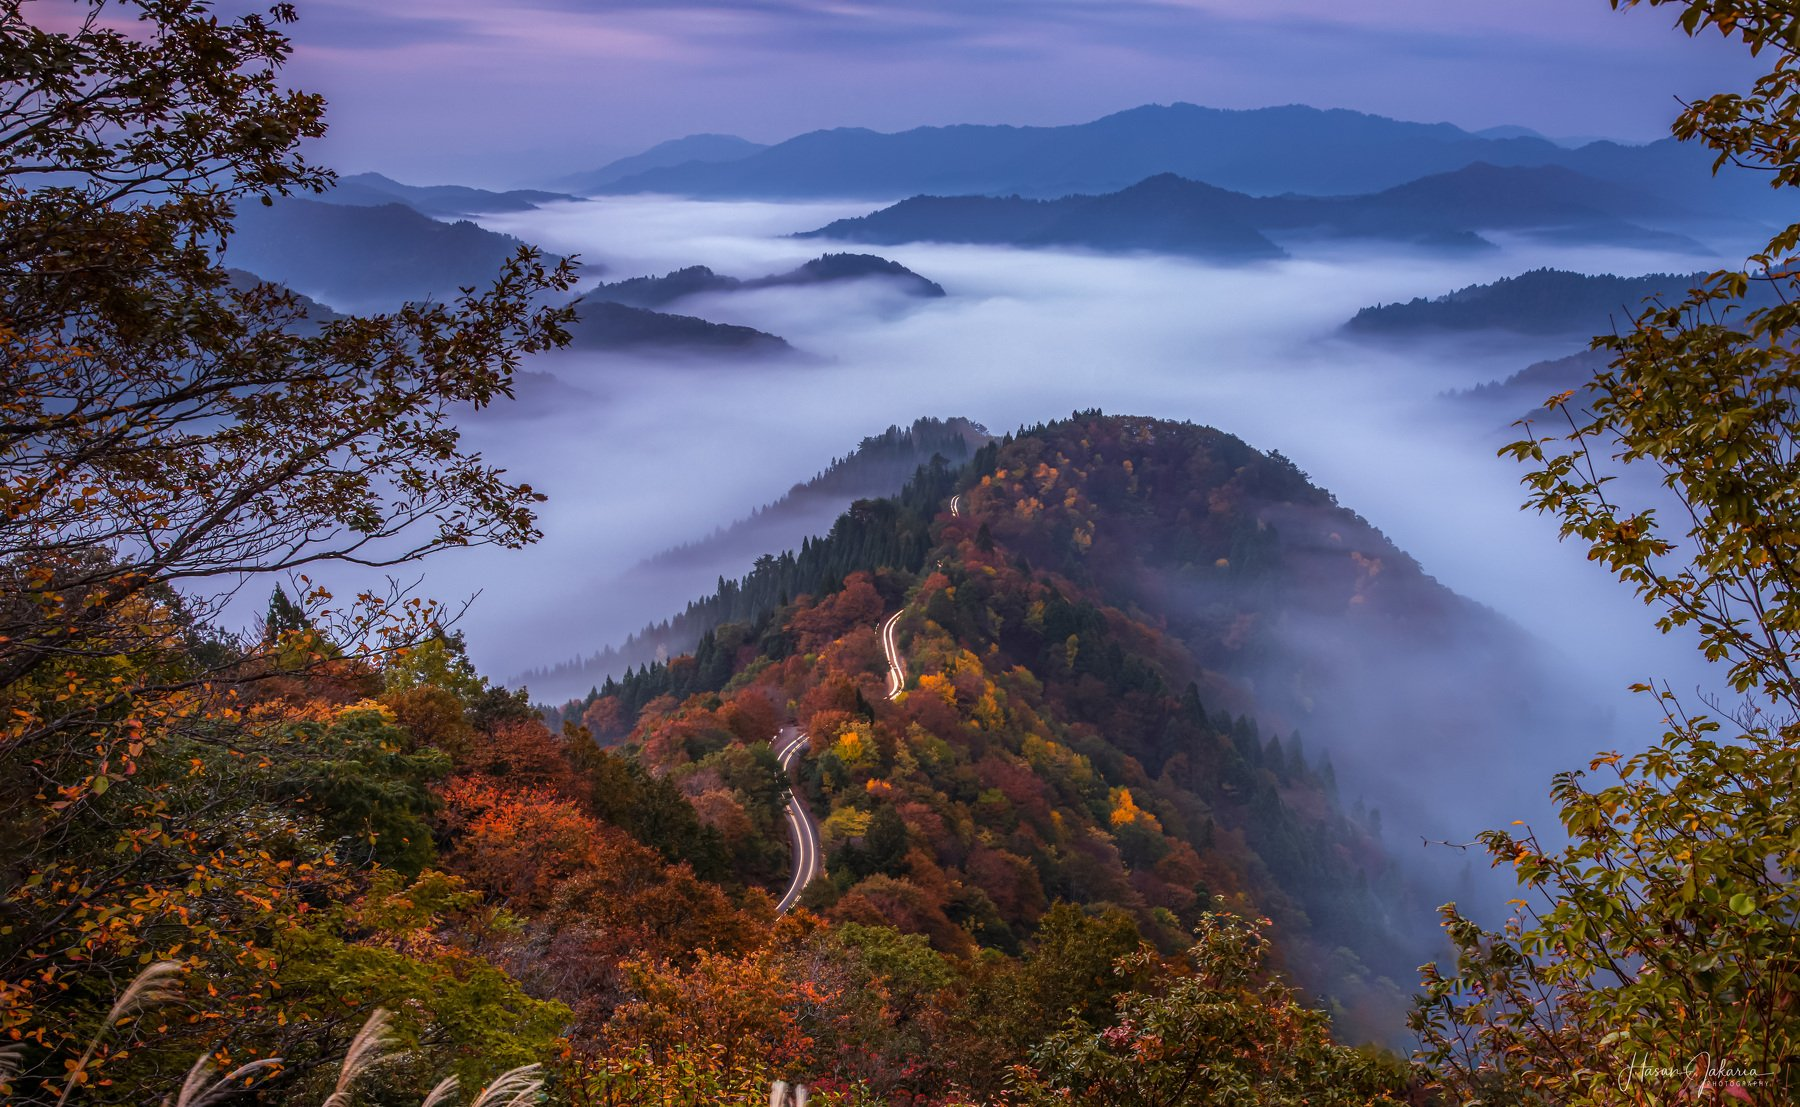 nature landscape japan mountain morning  autumn colors foggy, Hasan Jakaria